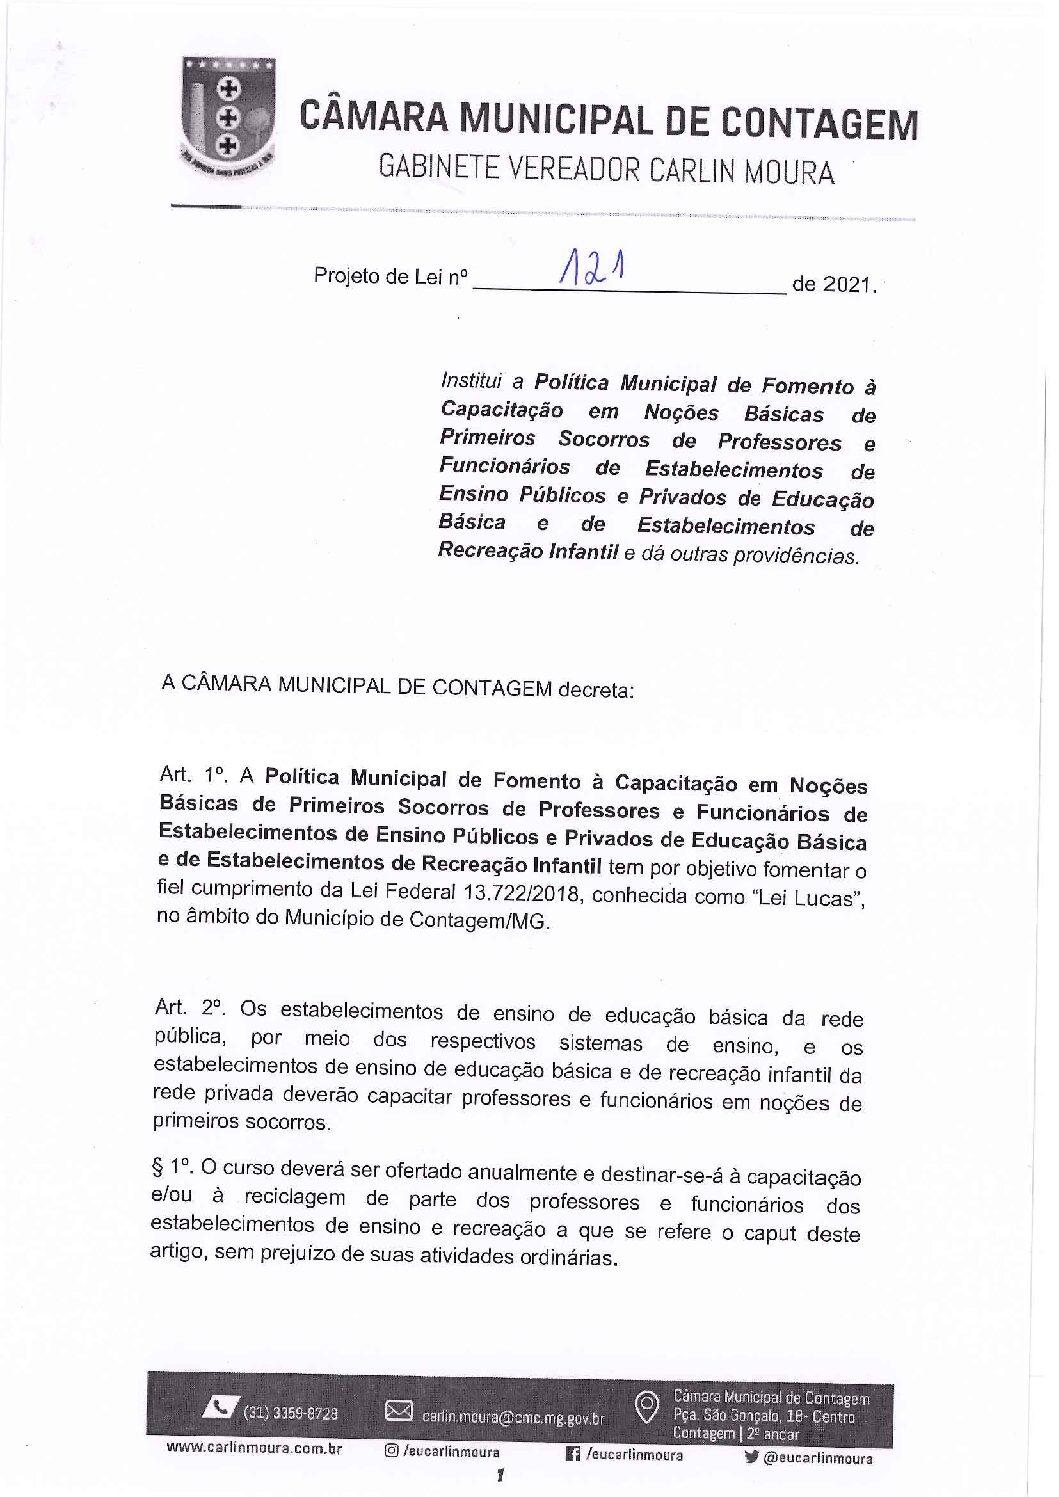 Projeto de lei 0121/2021